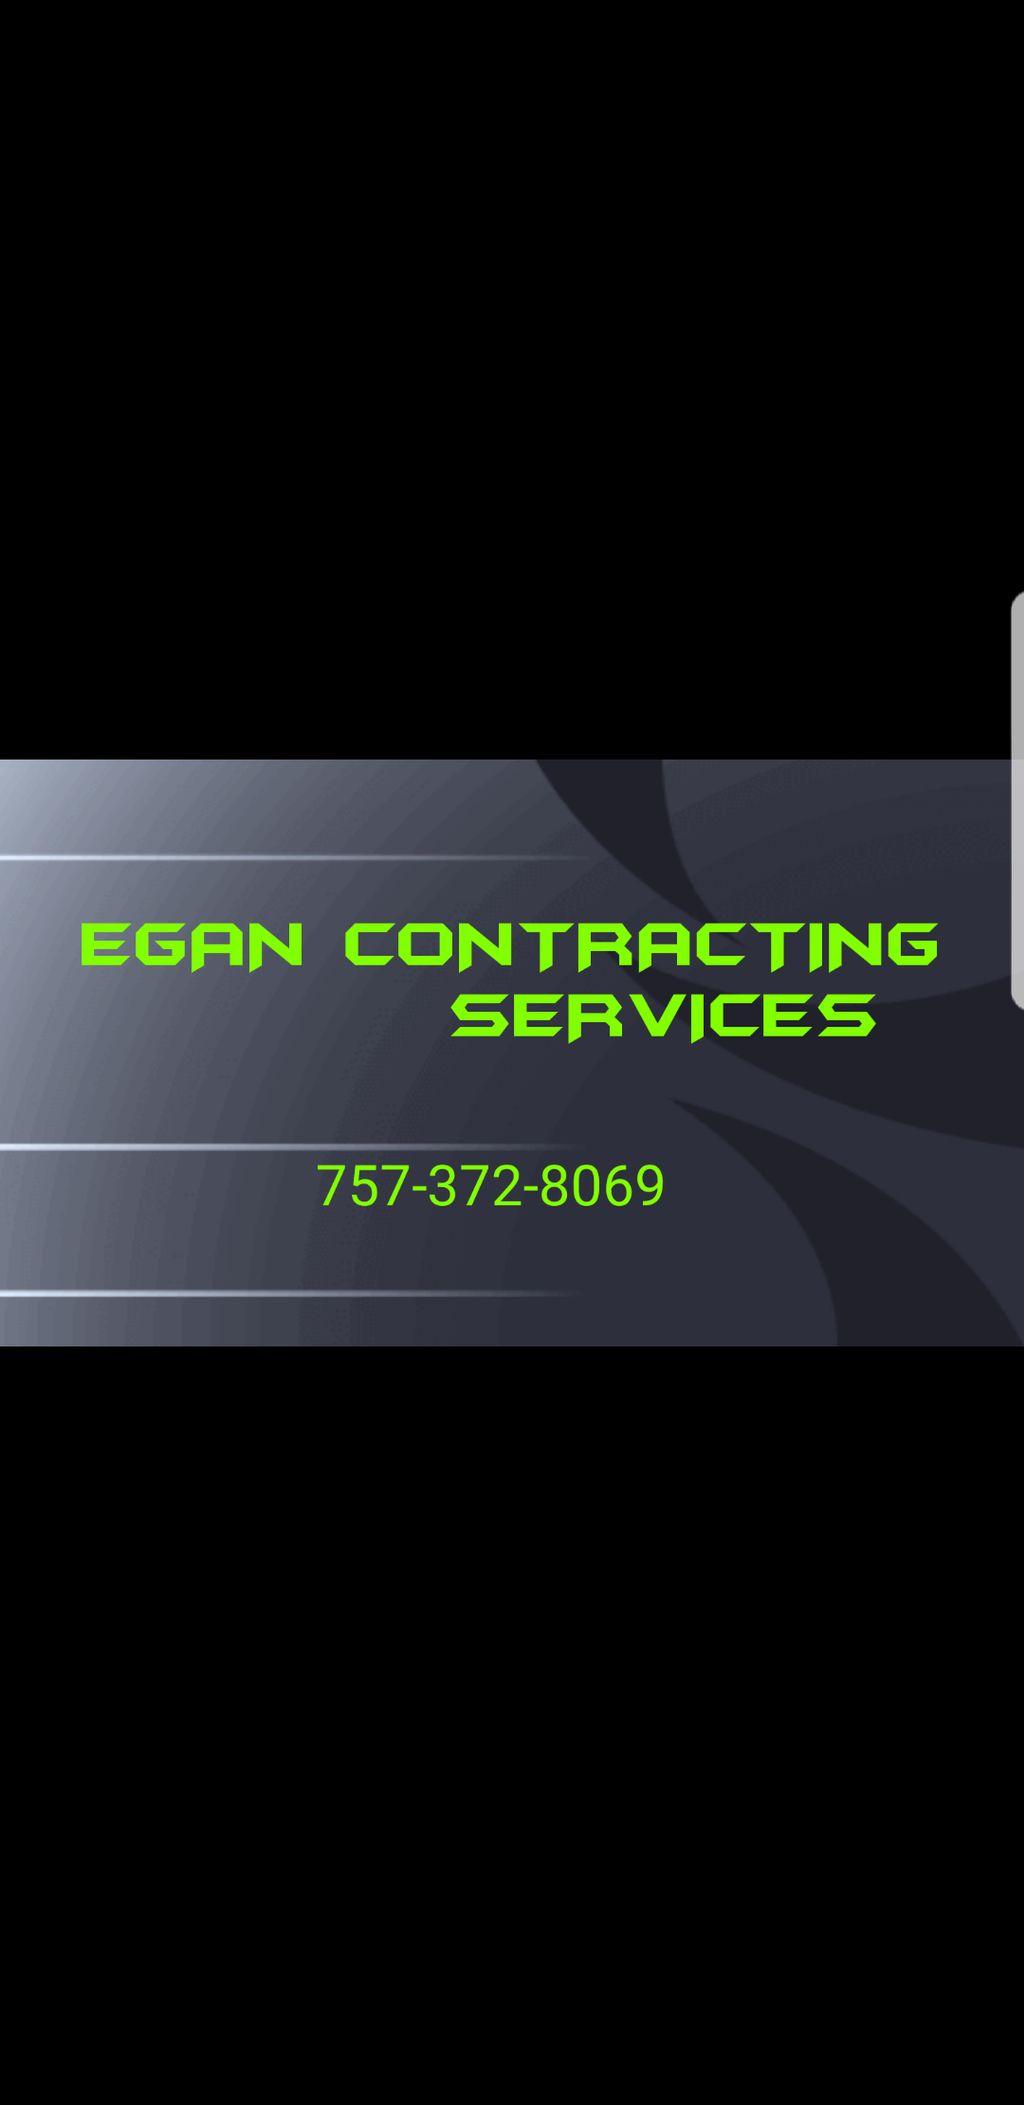 EGAN CONTRACTING SERVICES